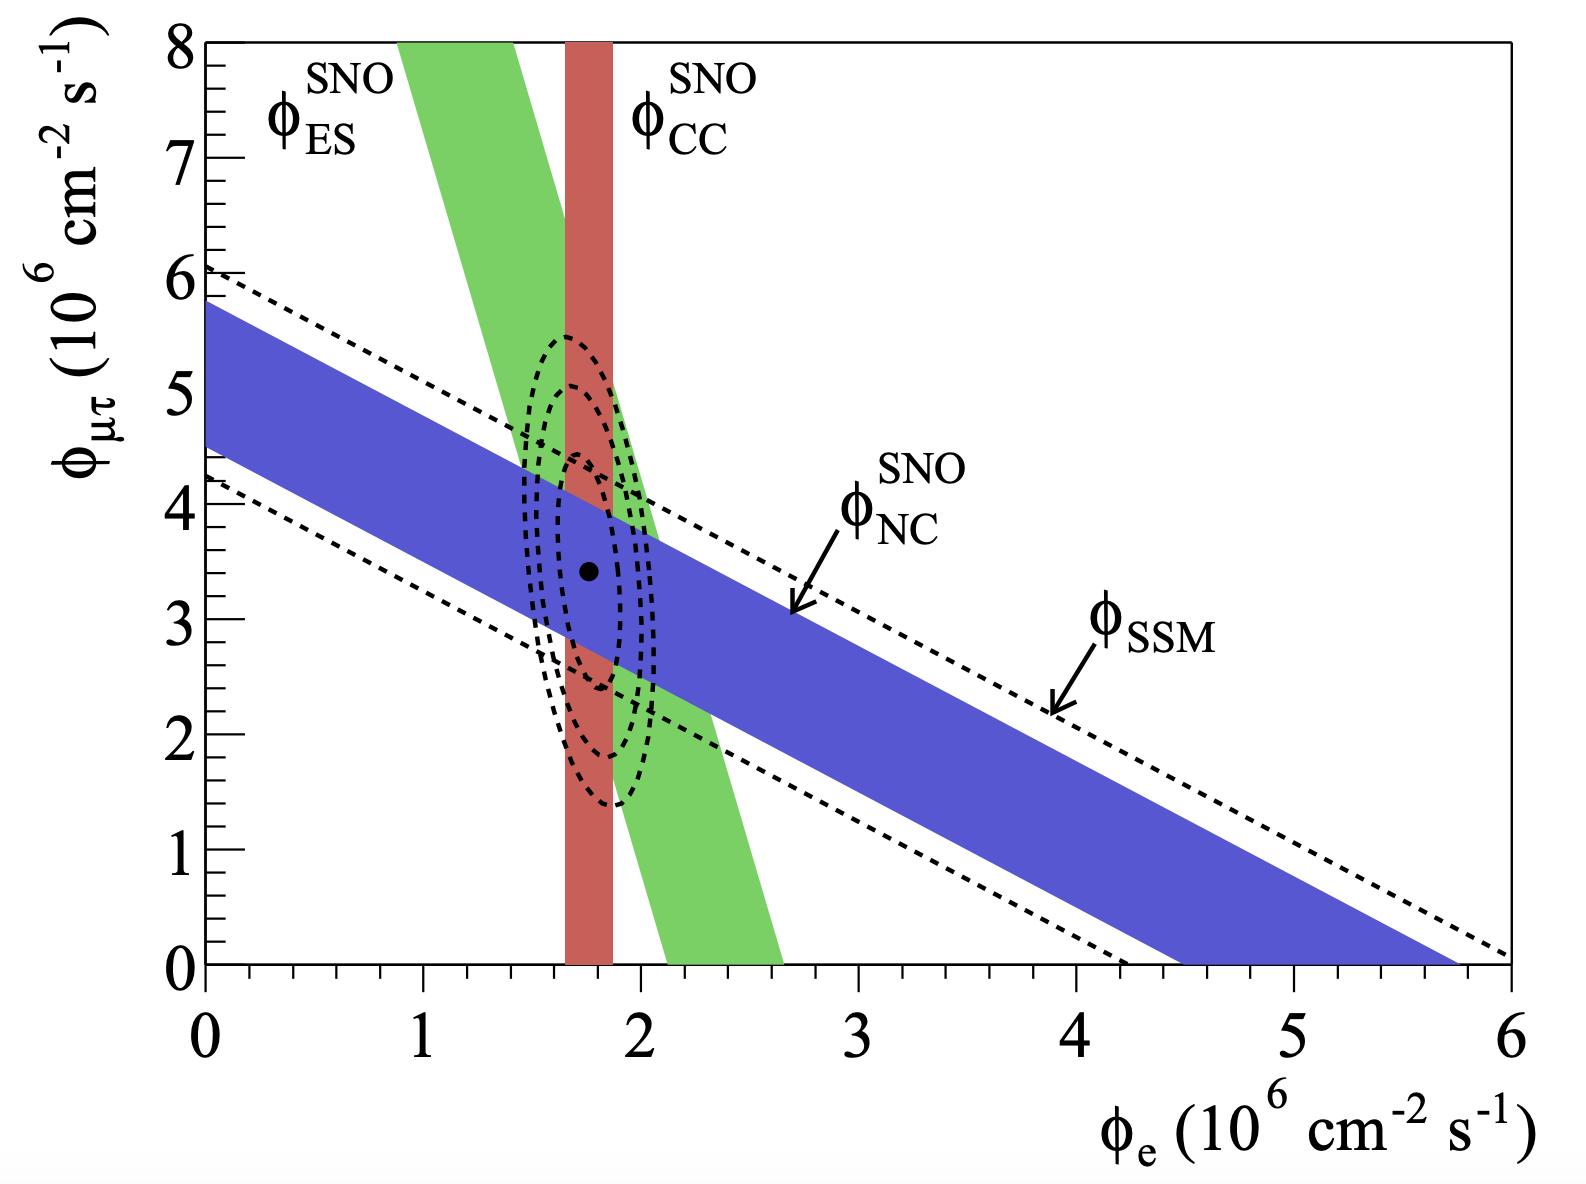 Solar neutrino flux measurement at SNO